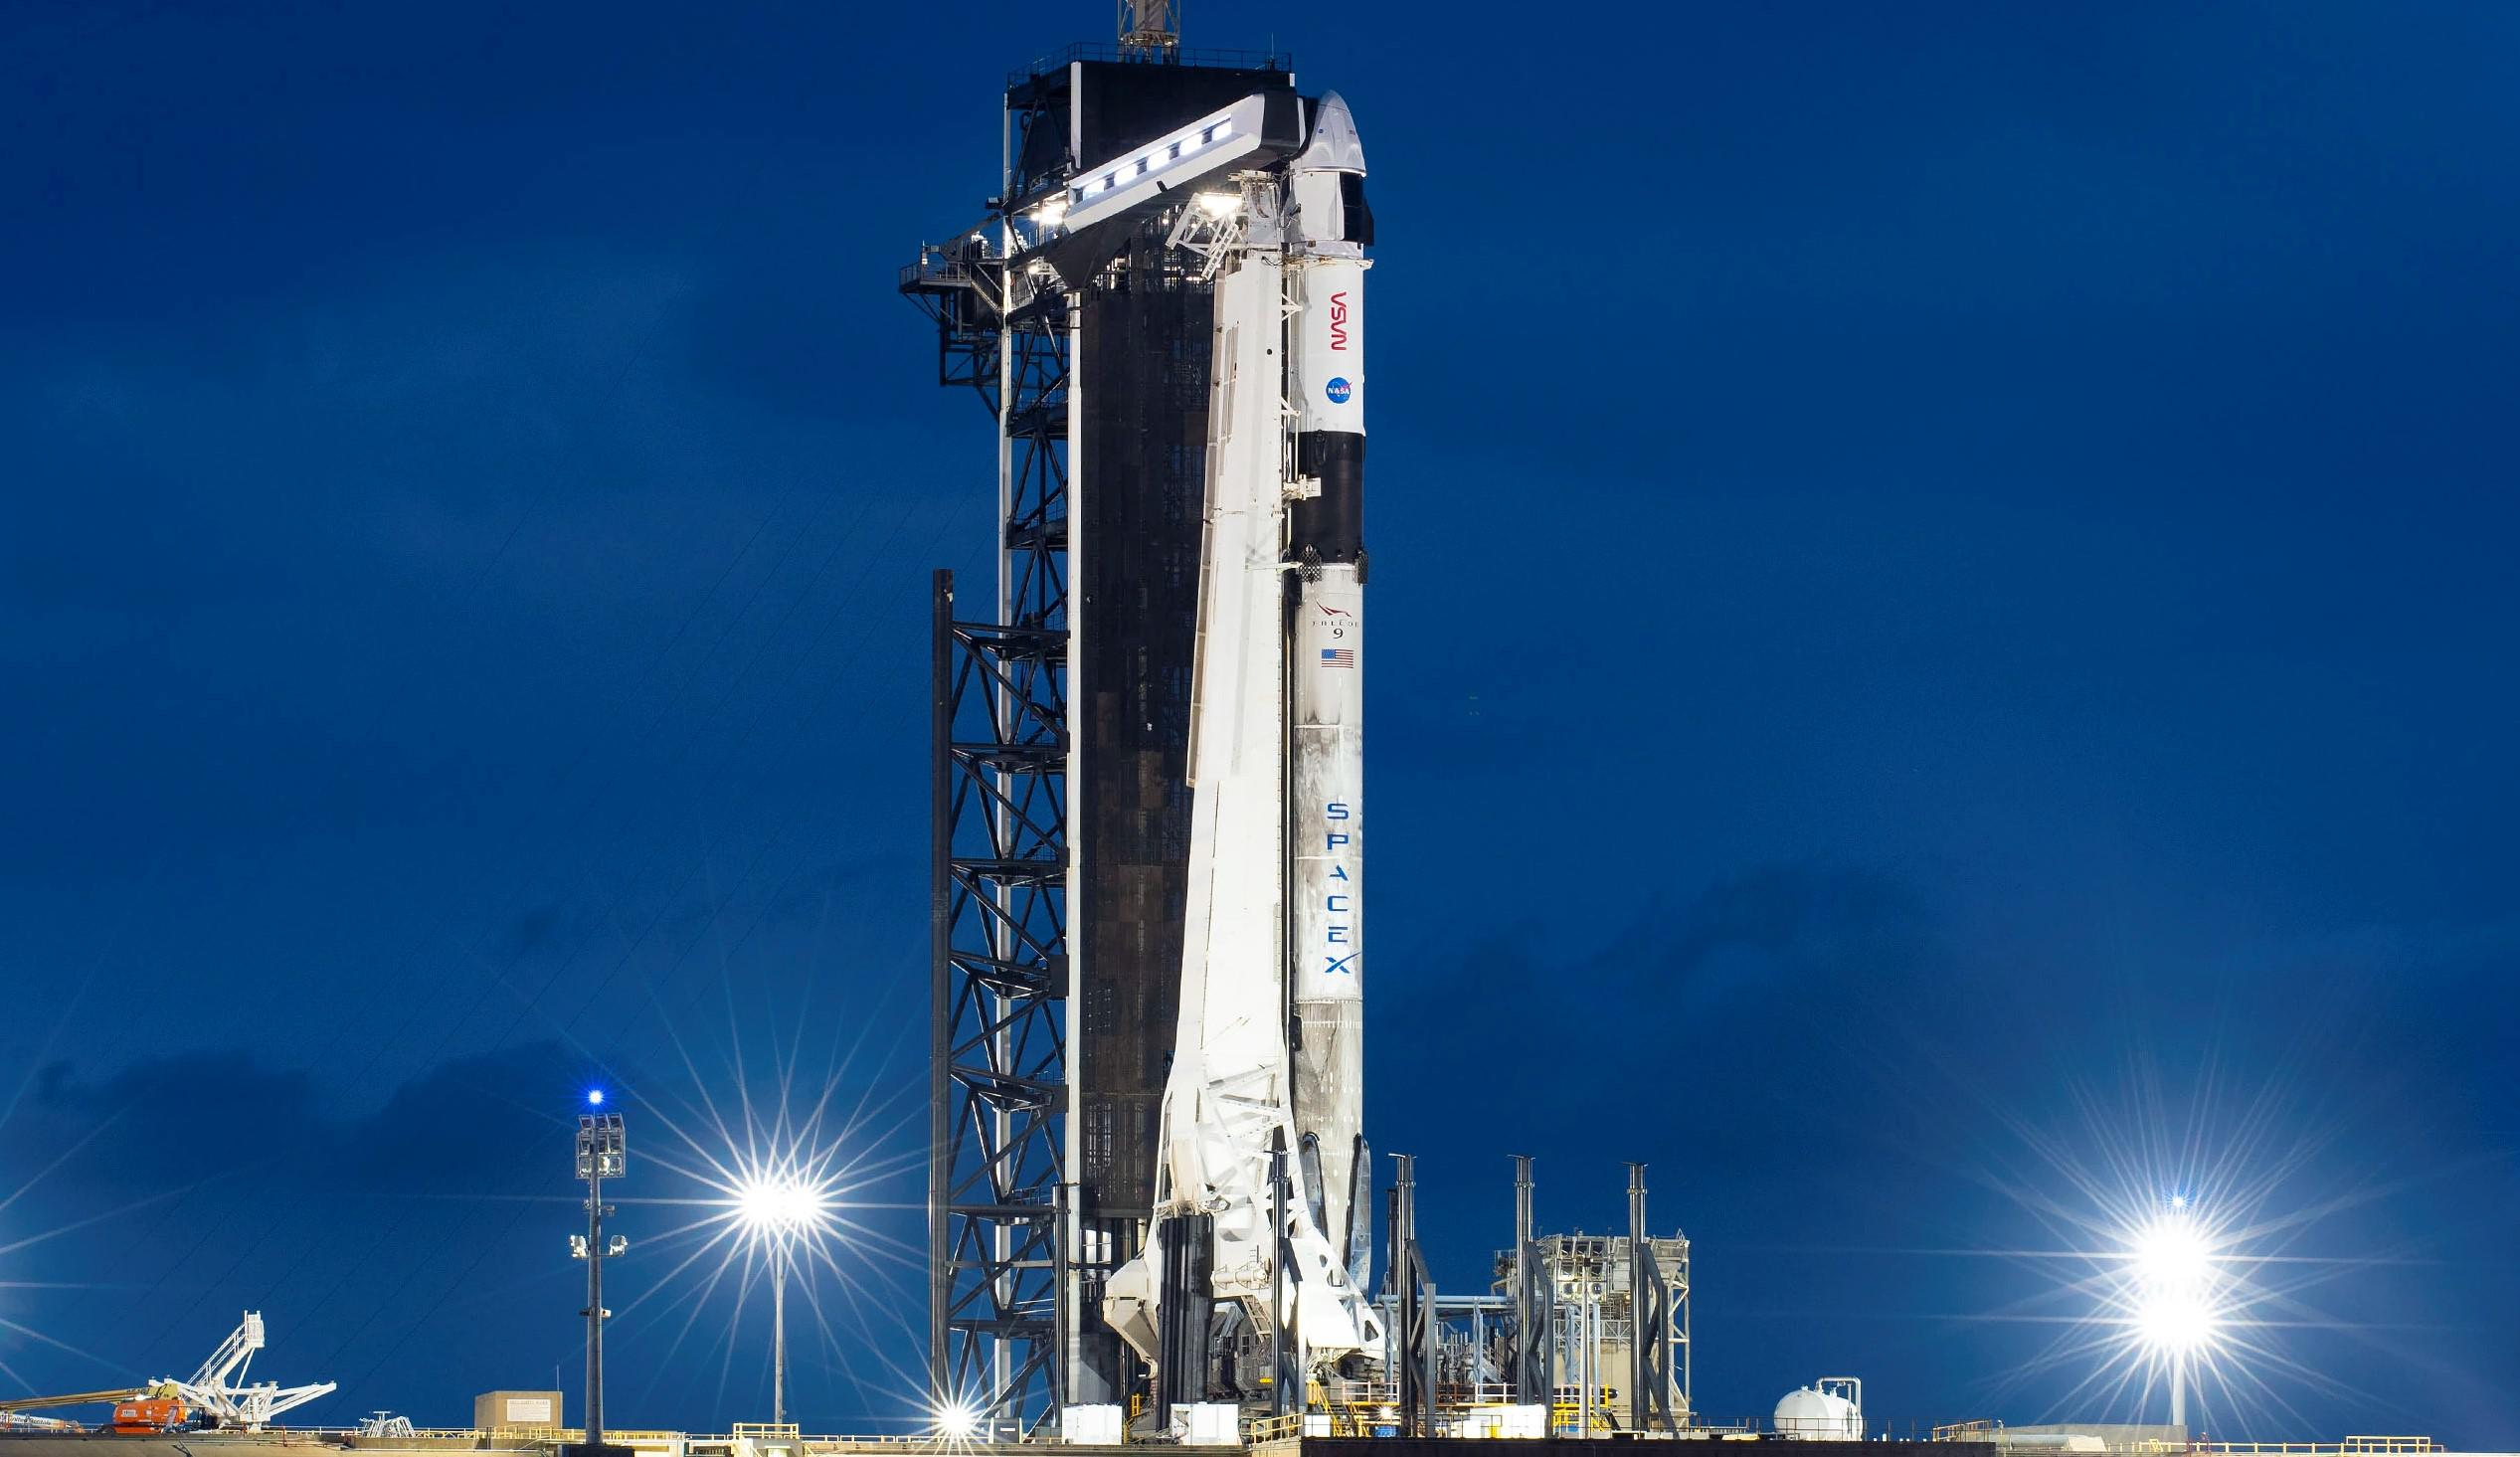 Crew-2 Crew Dragon C206 Falcon 9 B1061 39A 041621 (SpaceX) vertical 2 crop (c)